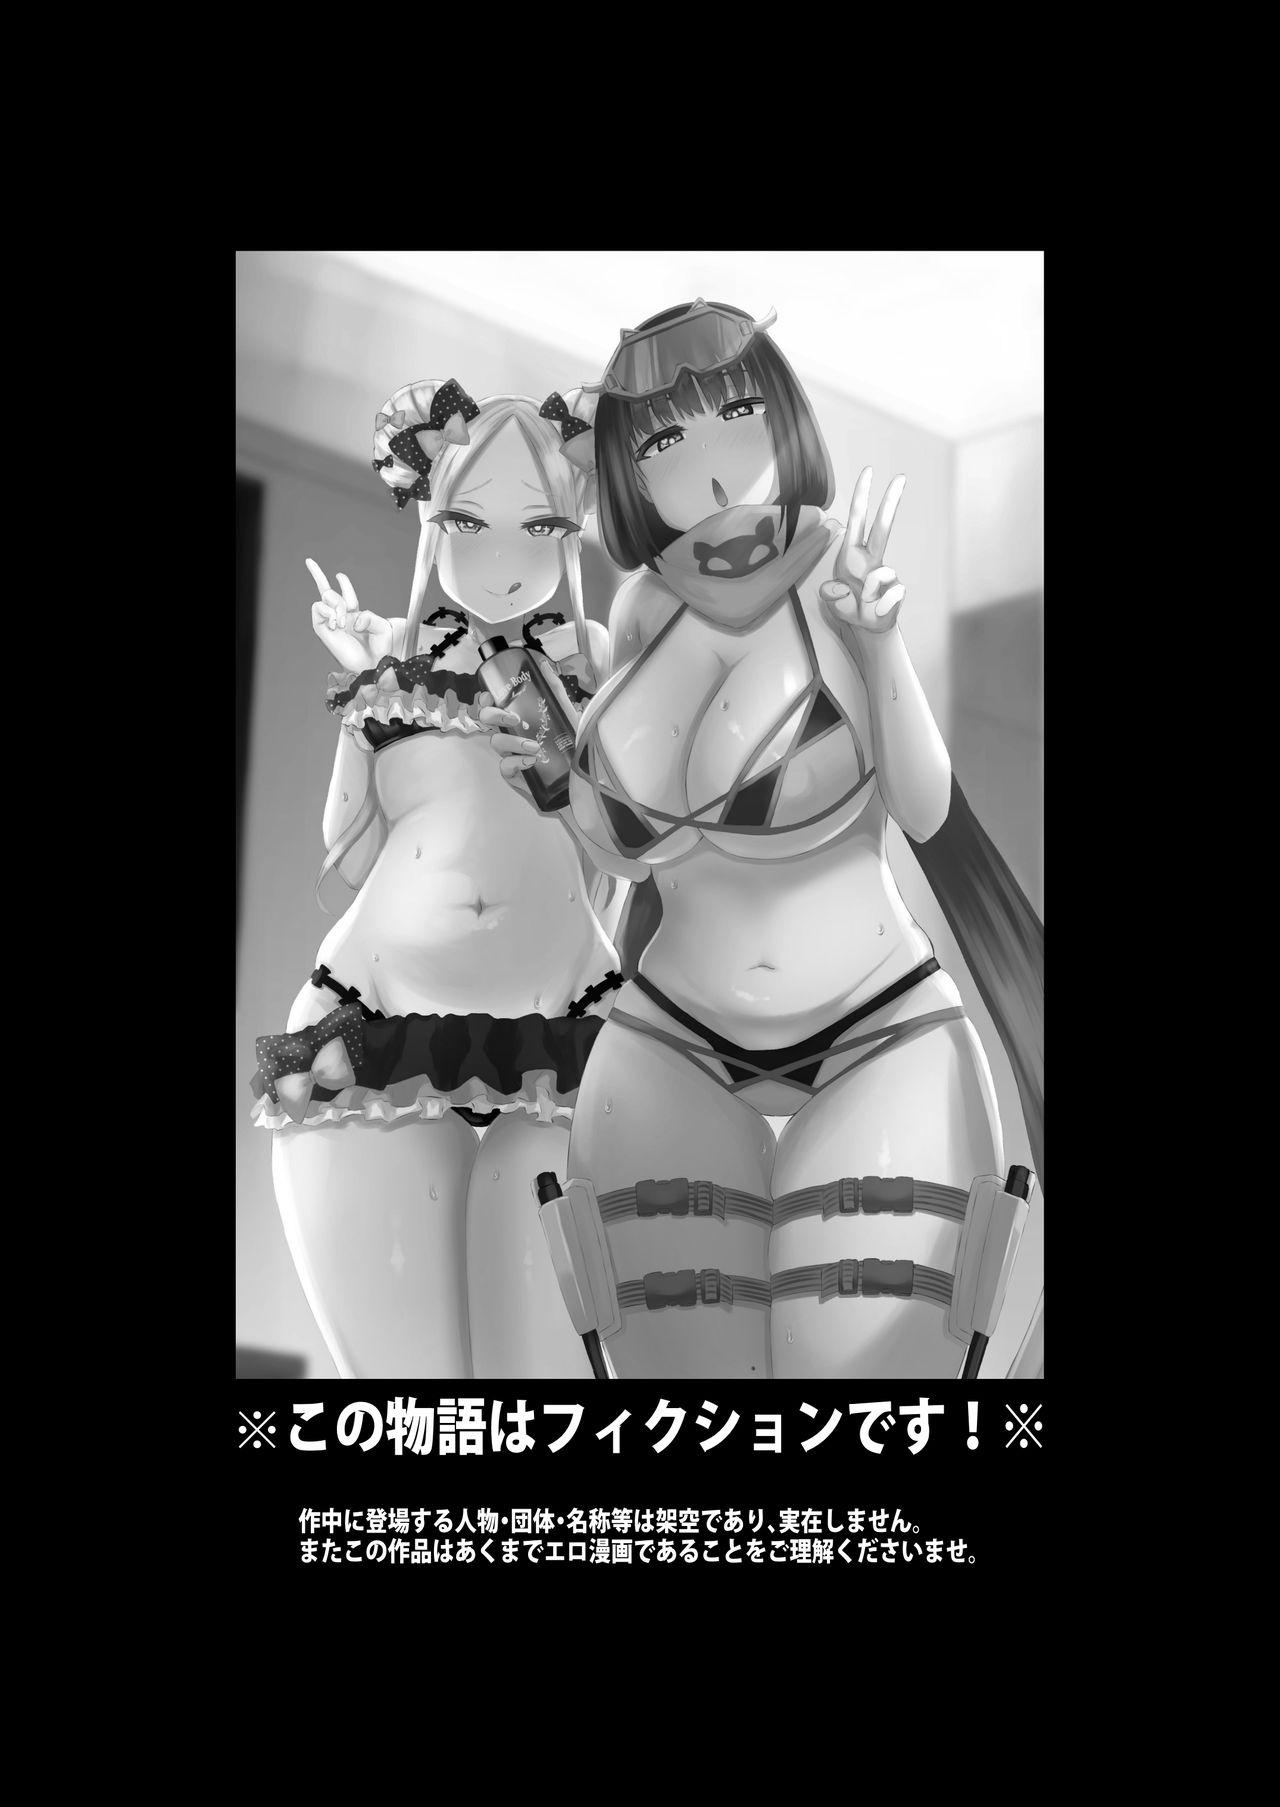 Ano~ Watashi-tachi Warui Cosplayer Janai yo   We're Not Bad Cosplayers, You Know 26